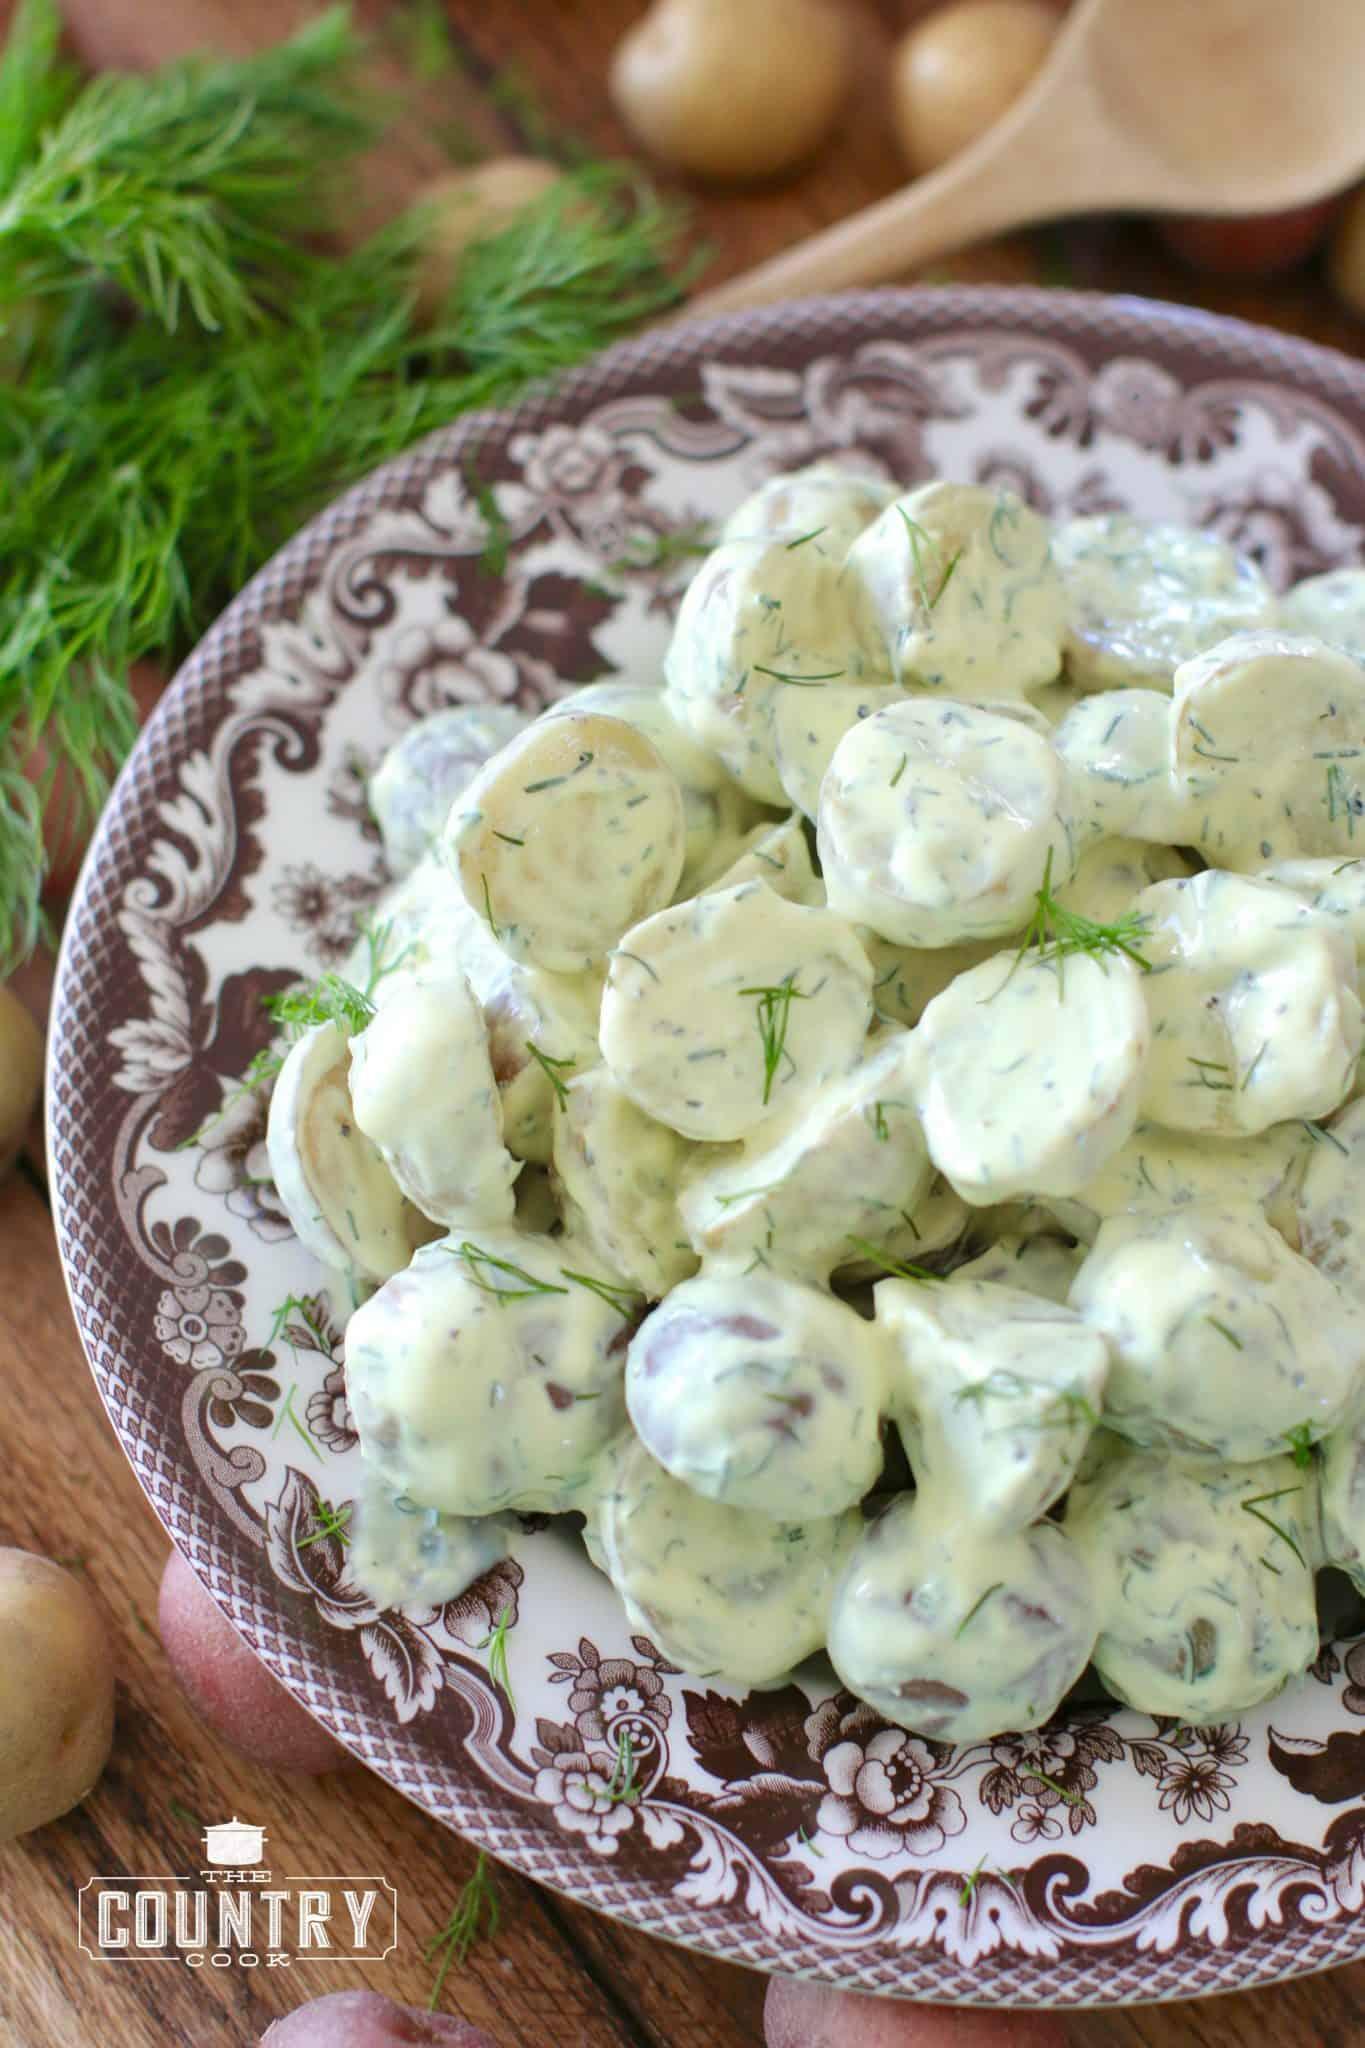 Greek Yogurt Dill Potato Salad - The Country Cook